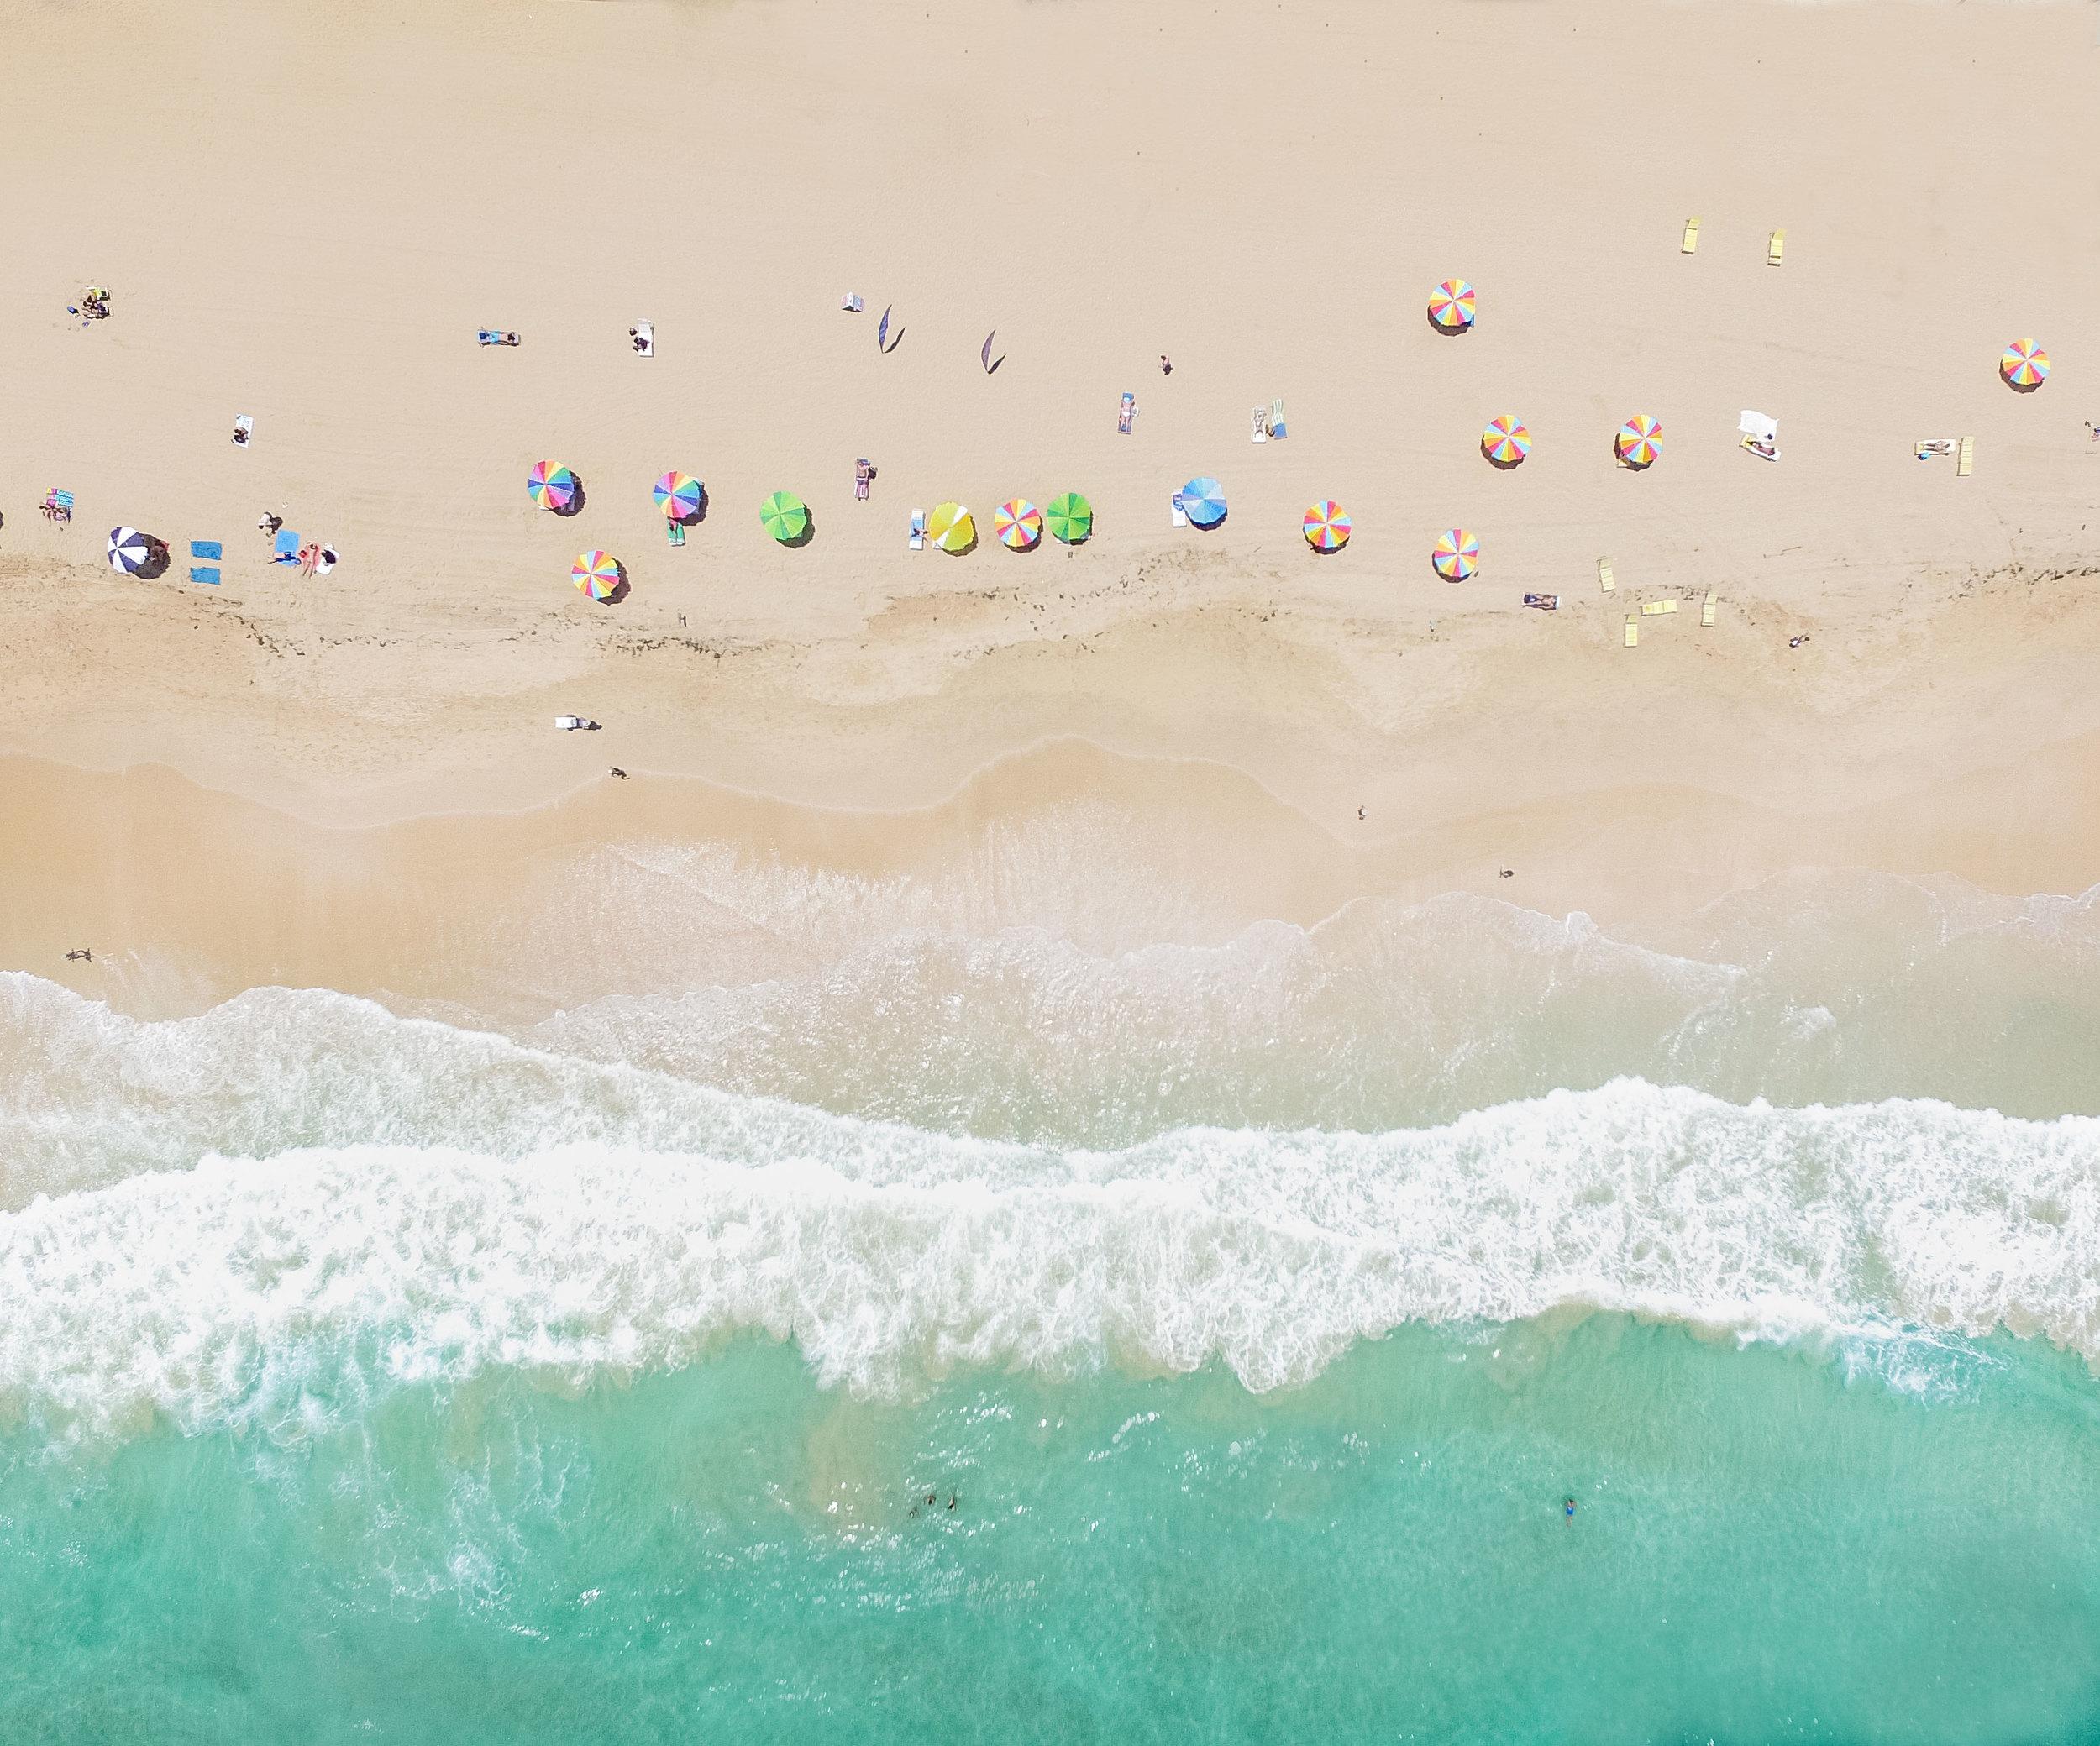 Playa; beach, Condado Puerto Rico.